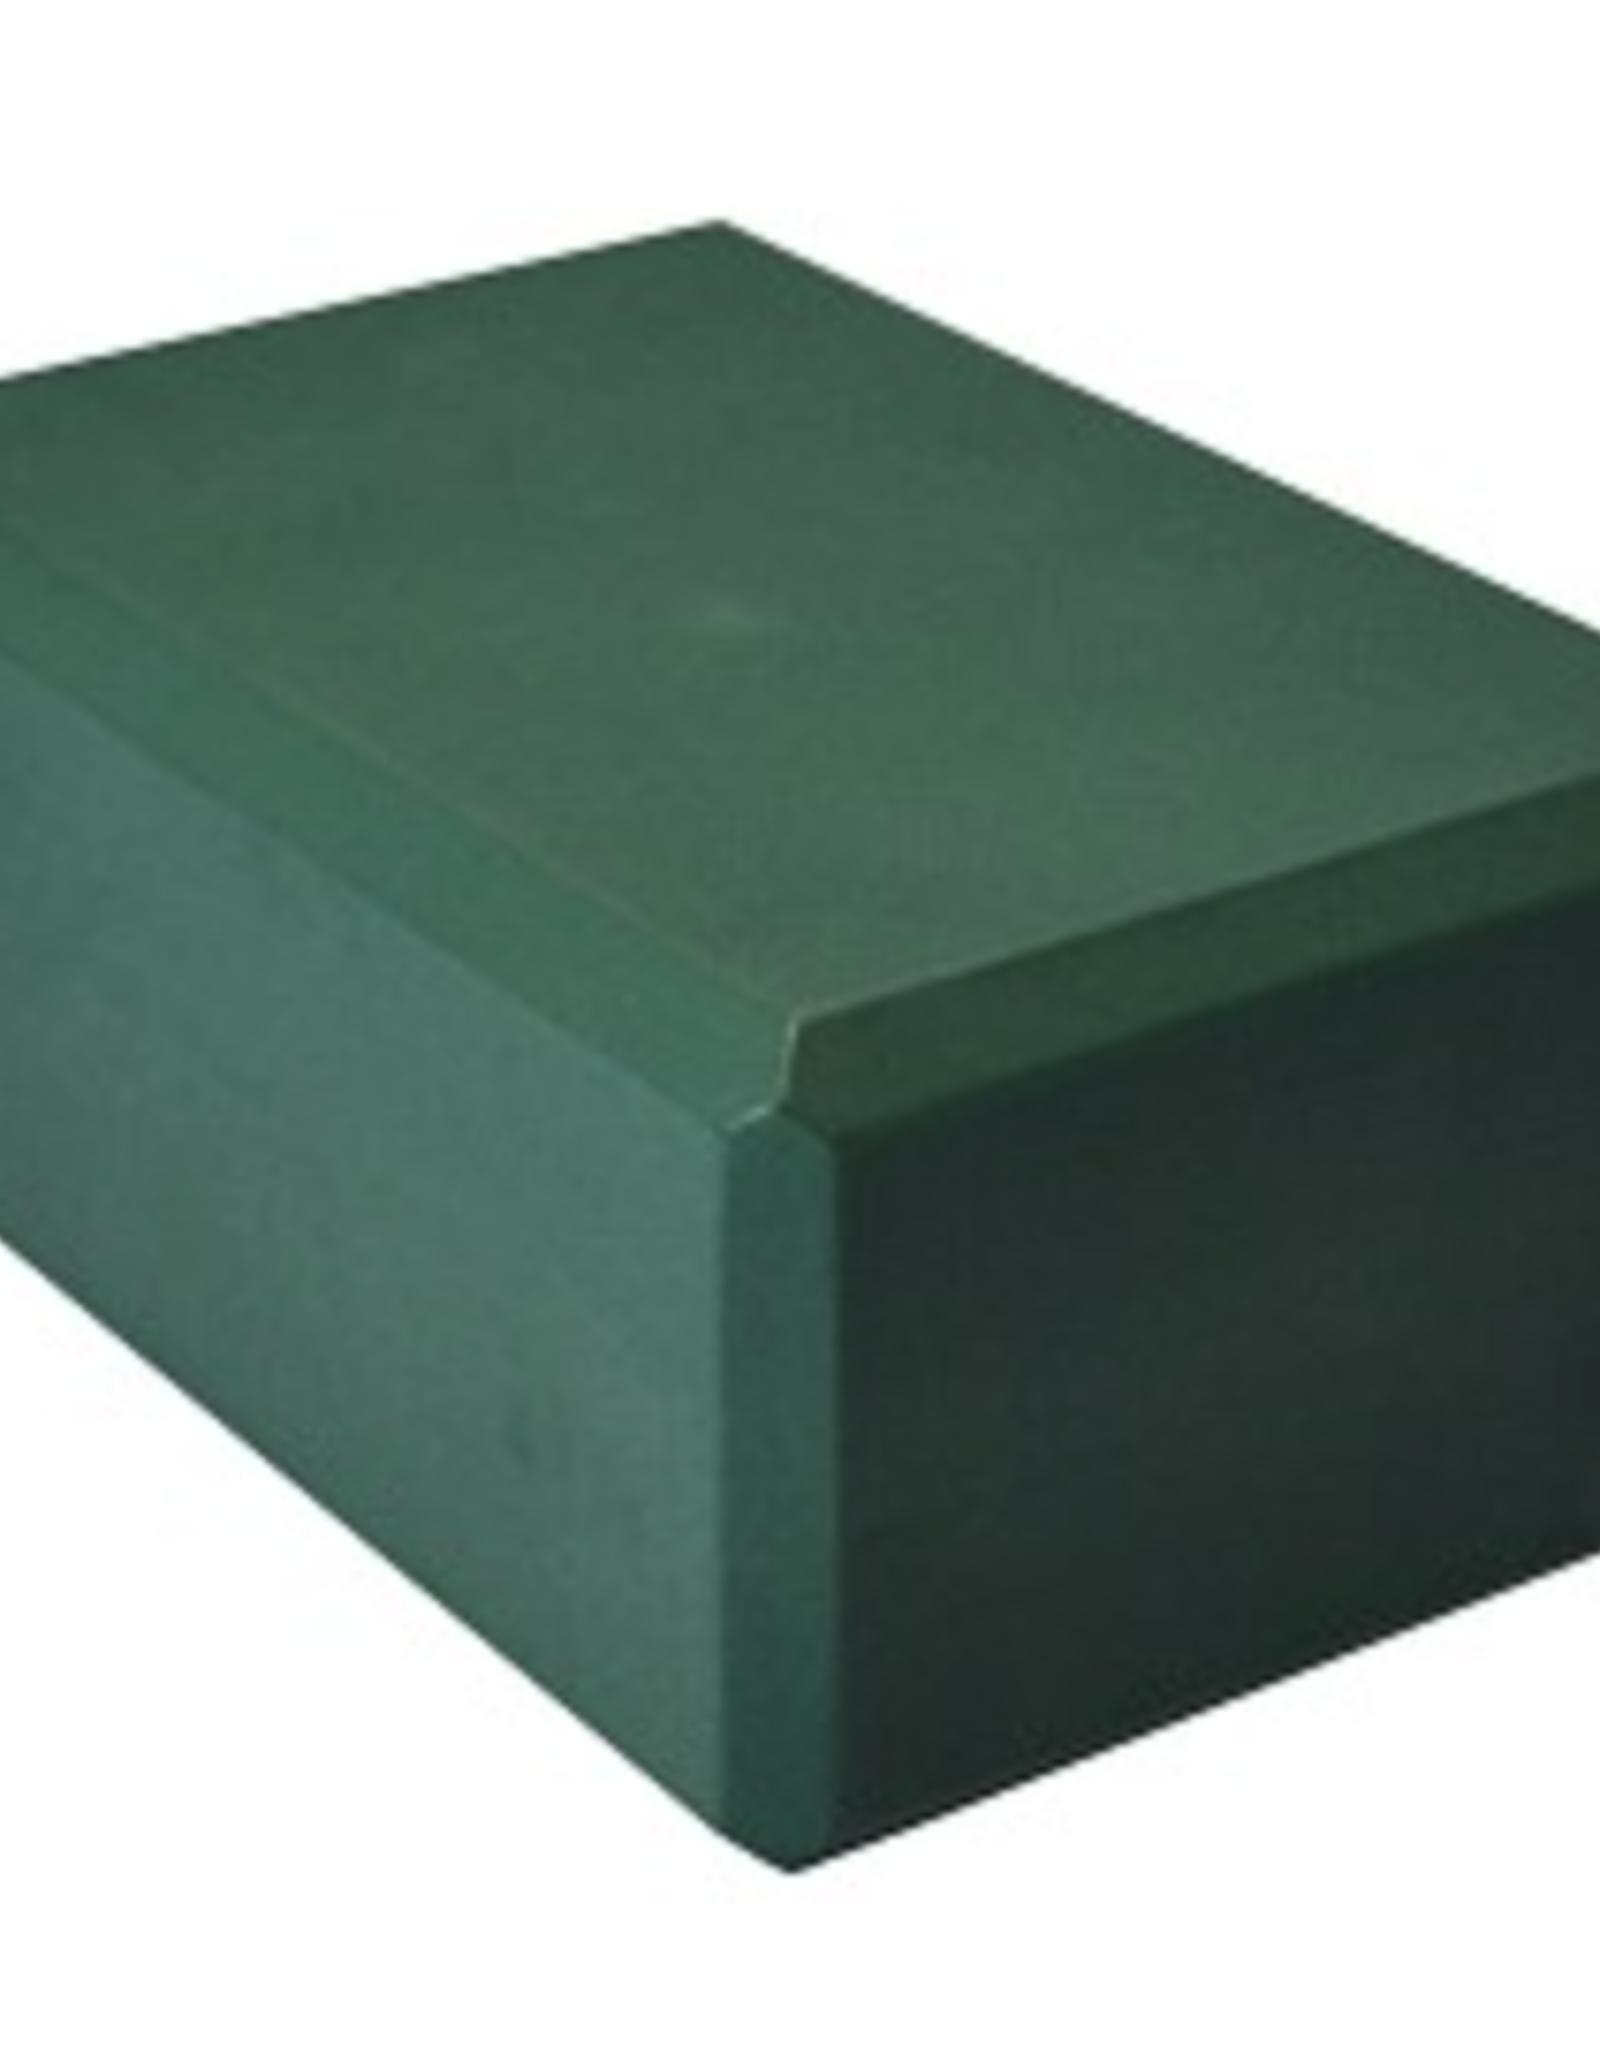 "Yoga Accessories 4"" Yoga Foam Block - Forest Green"